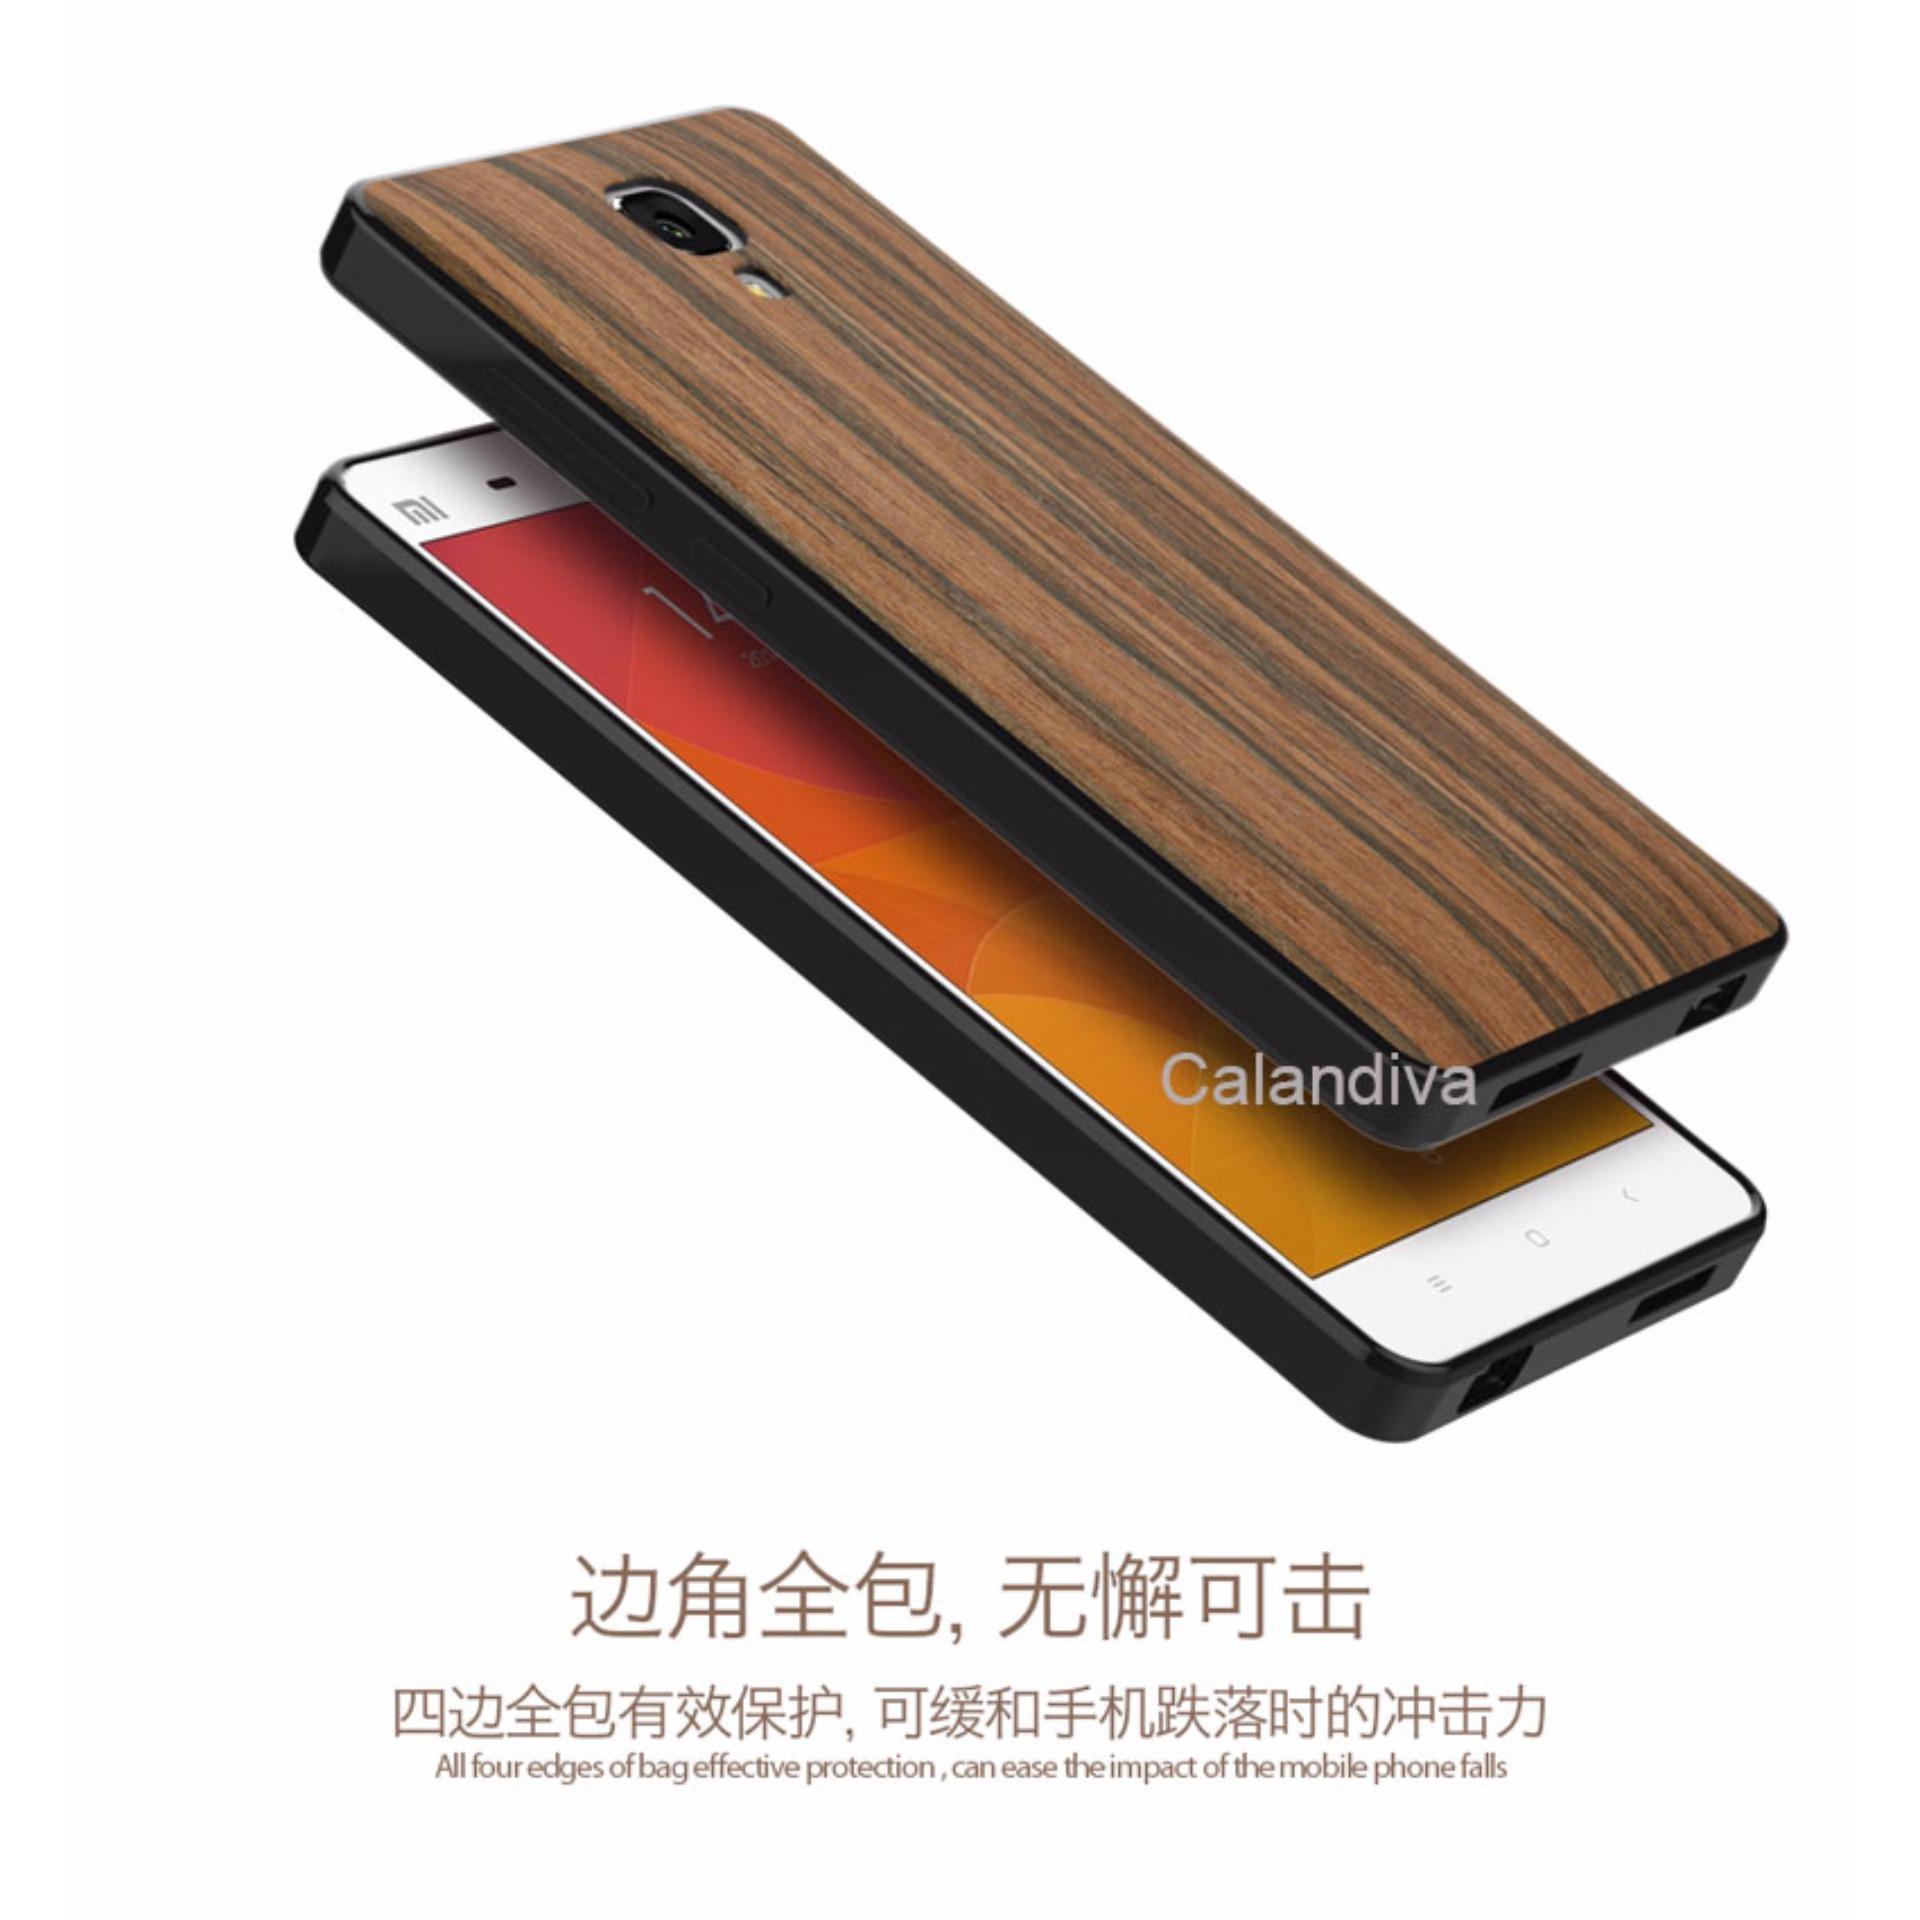 Calandiva Wood Texture Slim Softcase for Xiaomi Mi 4 / Mi 4w -